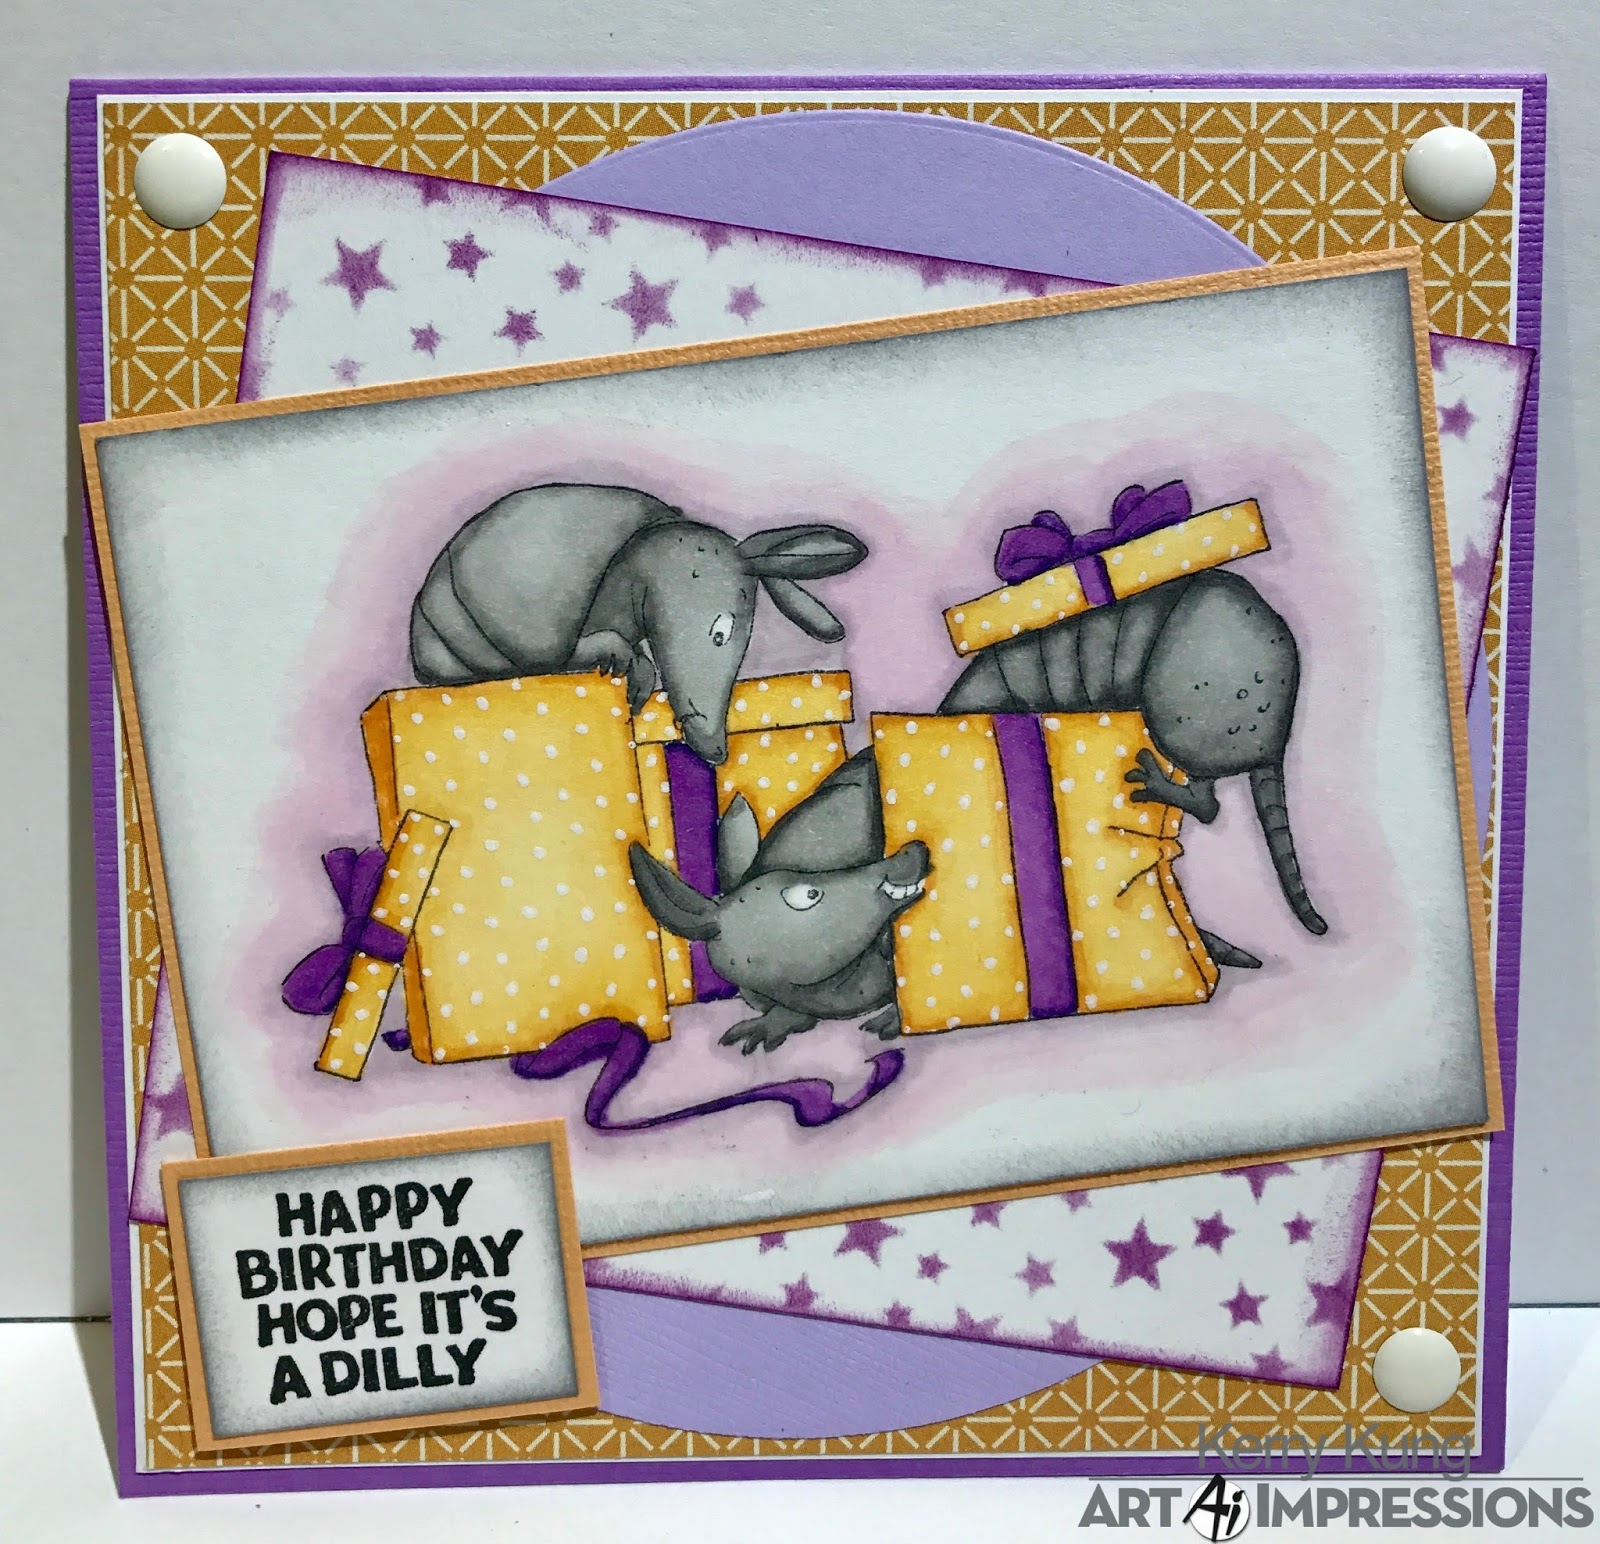 Art Impressions Blog: Happy Happy Birthday! By Kerry